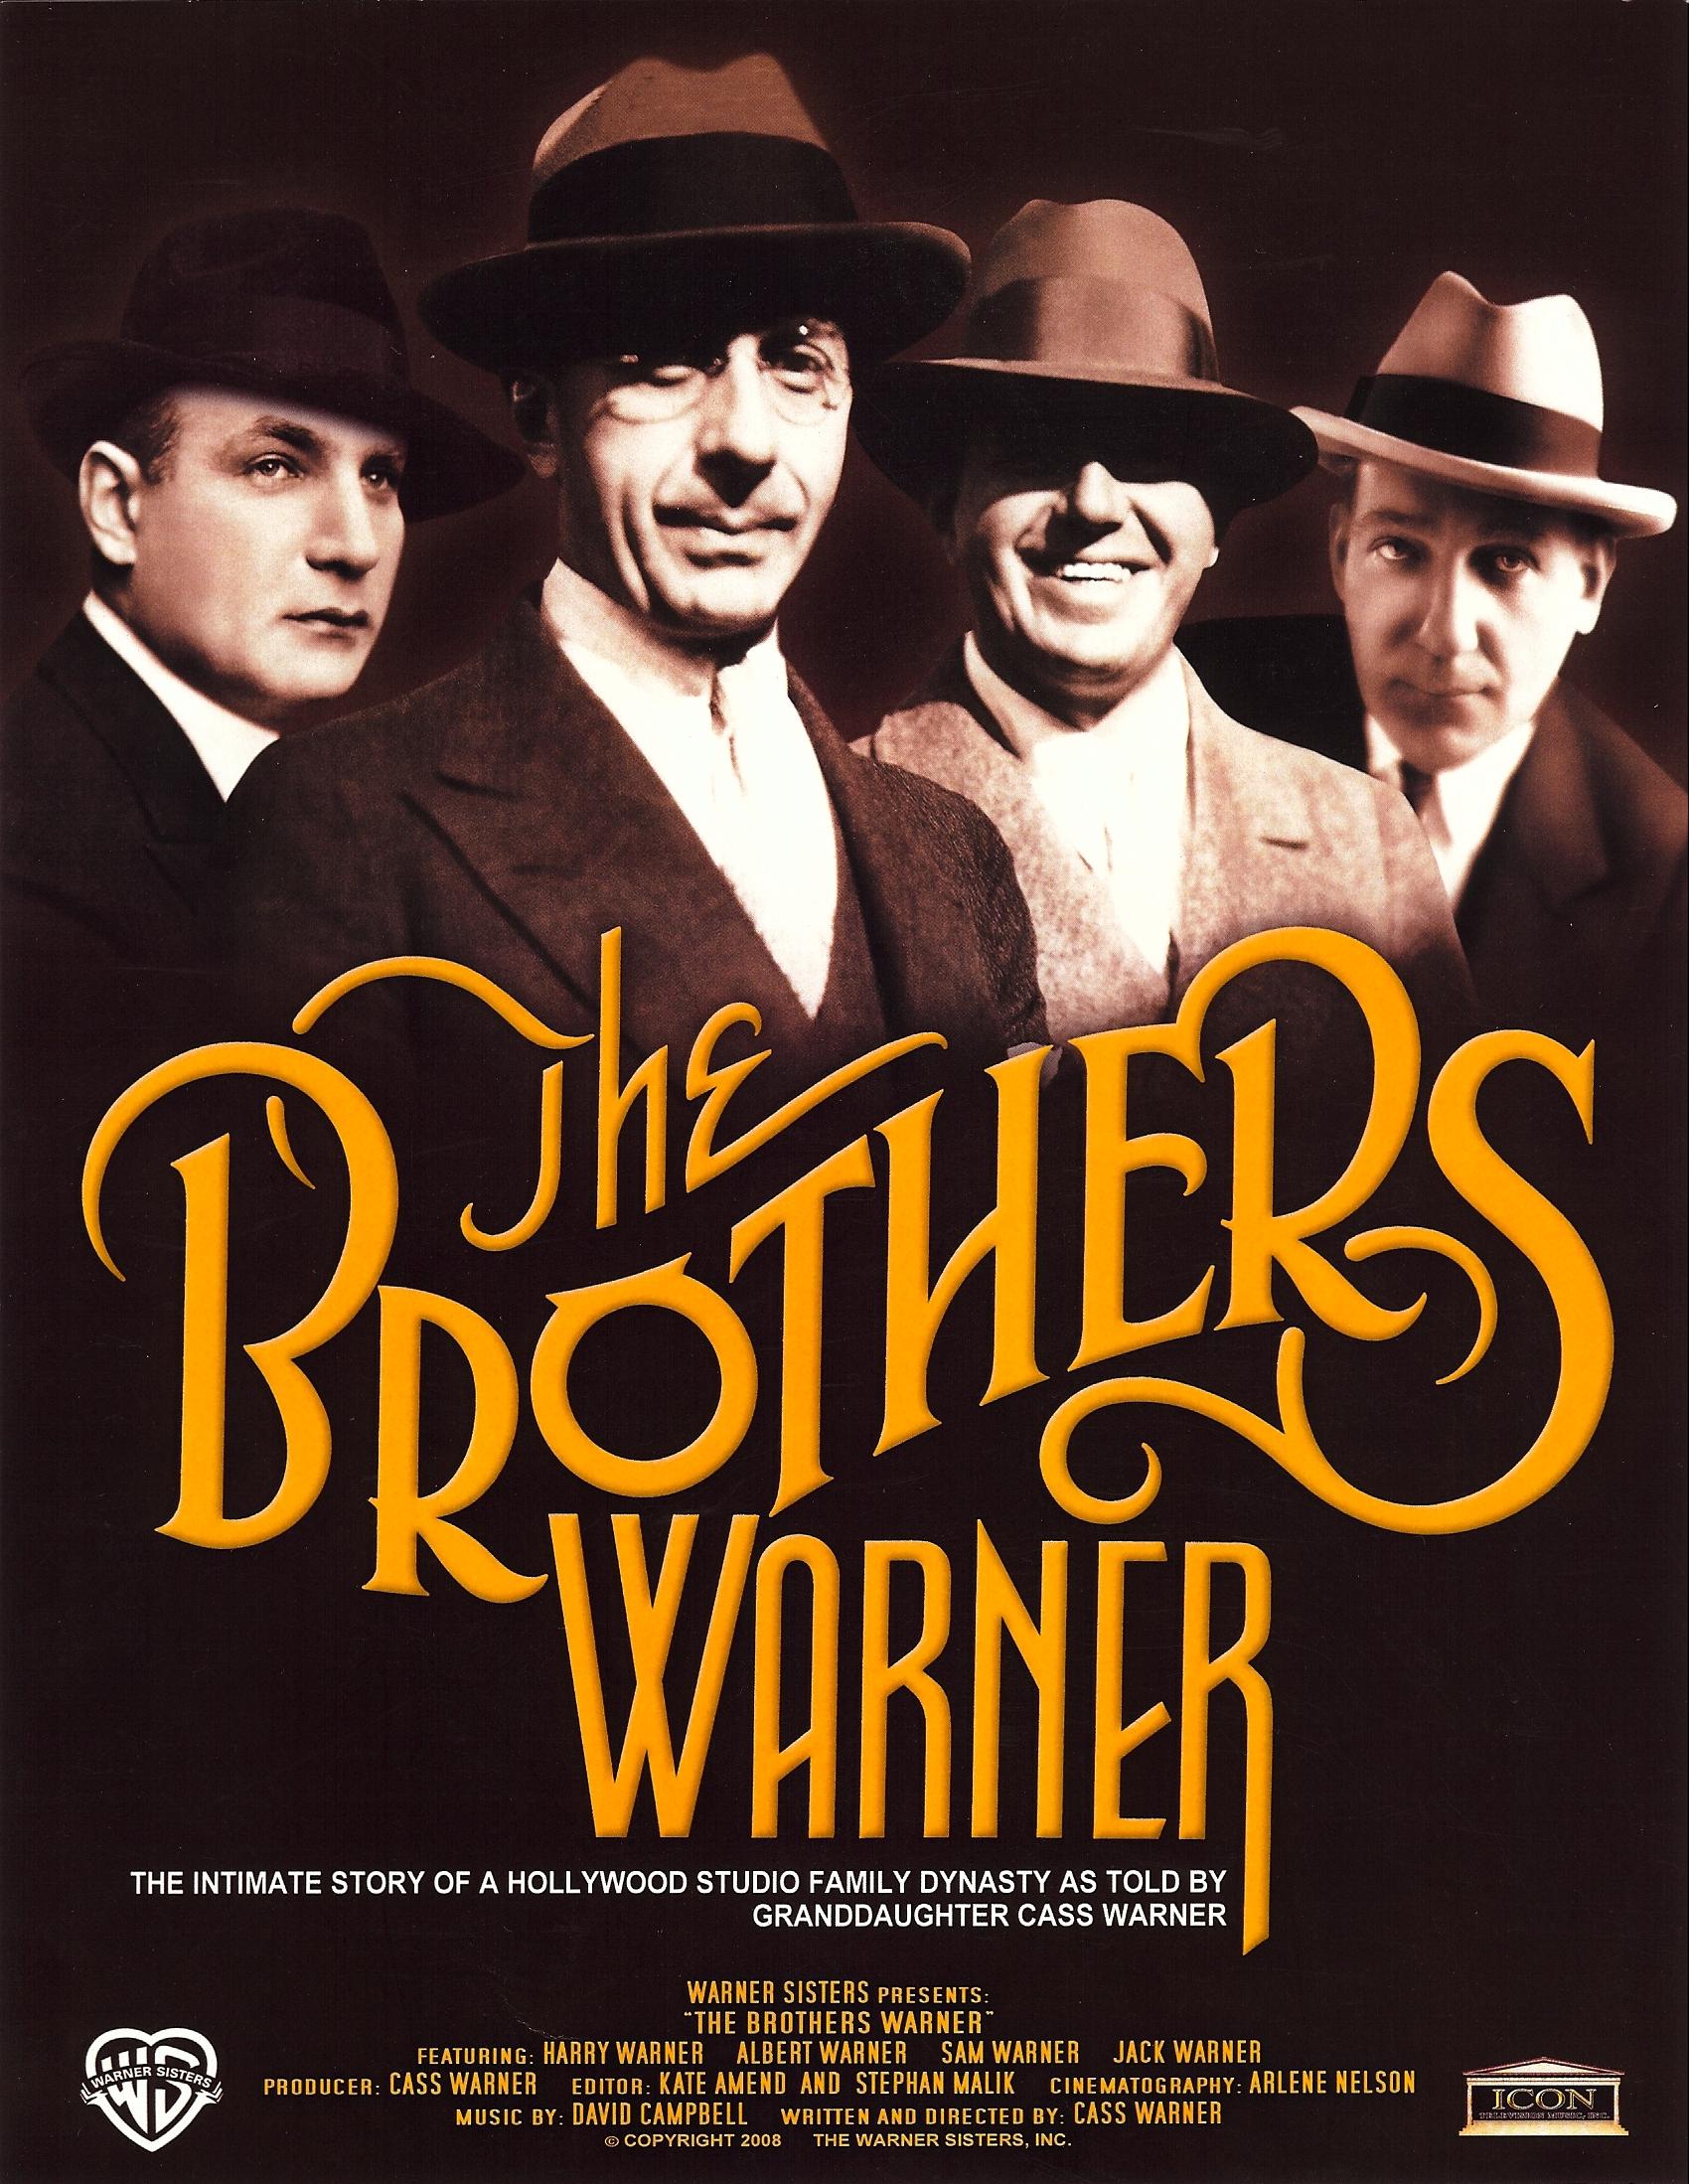 BrothersWarner